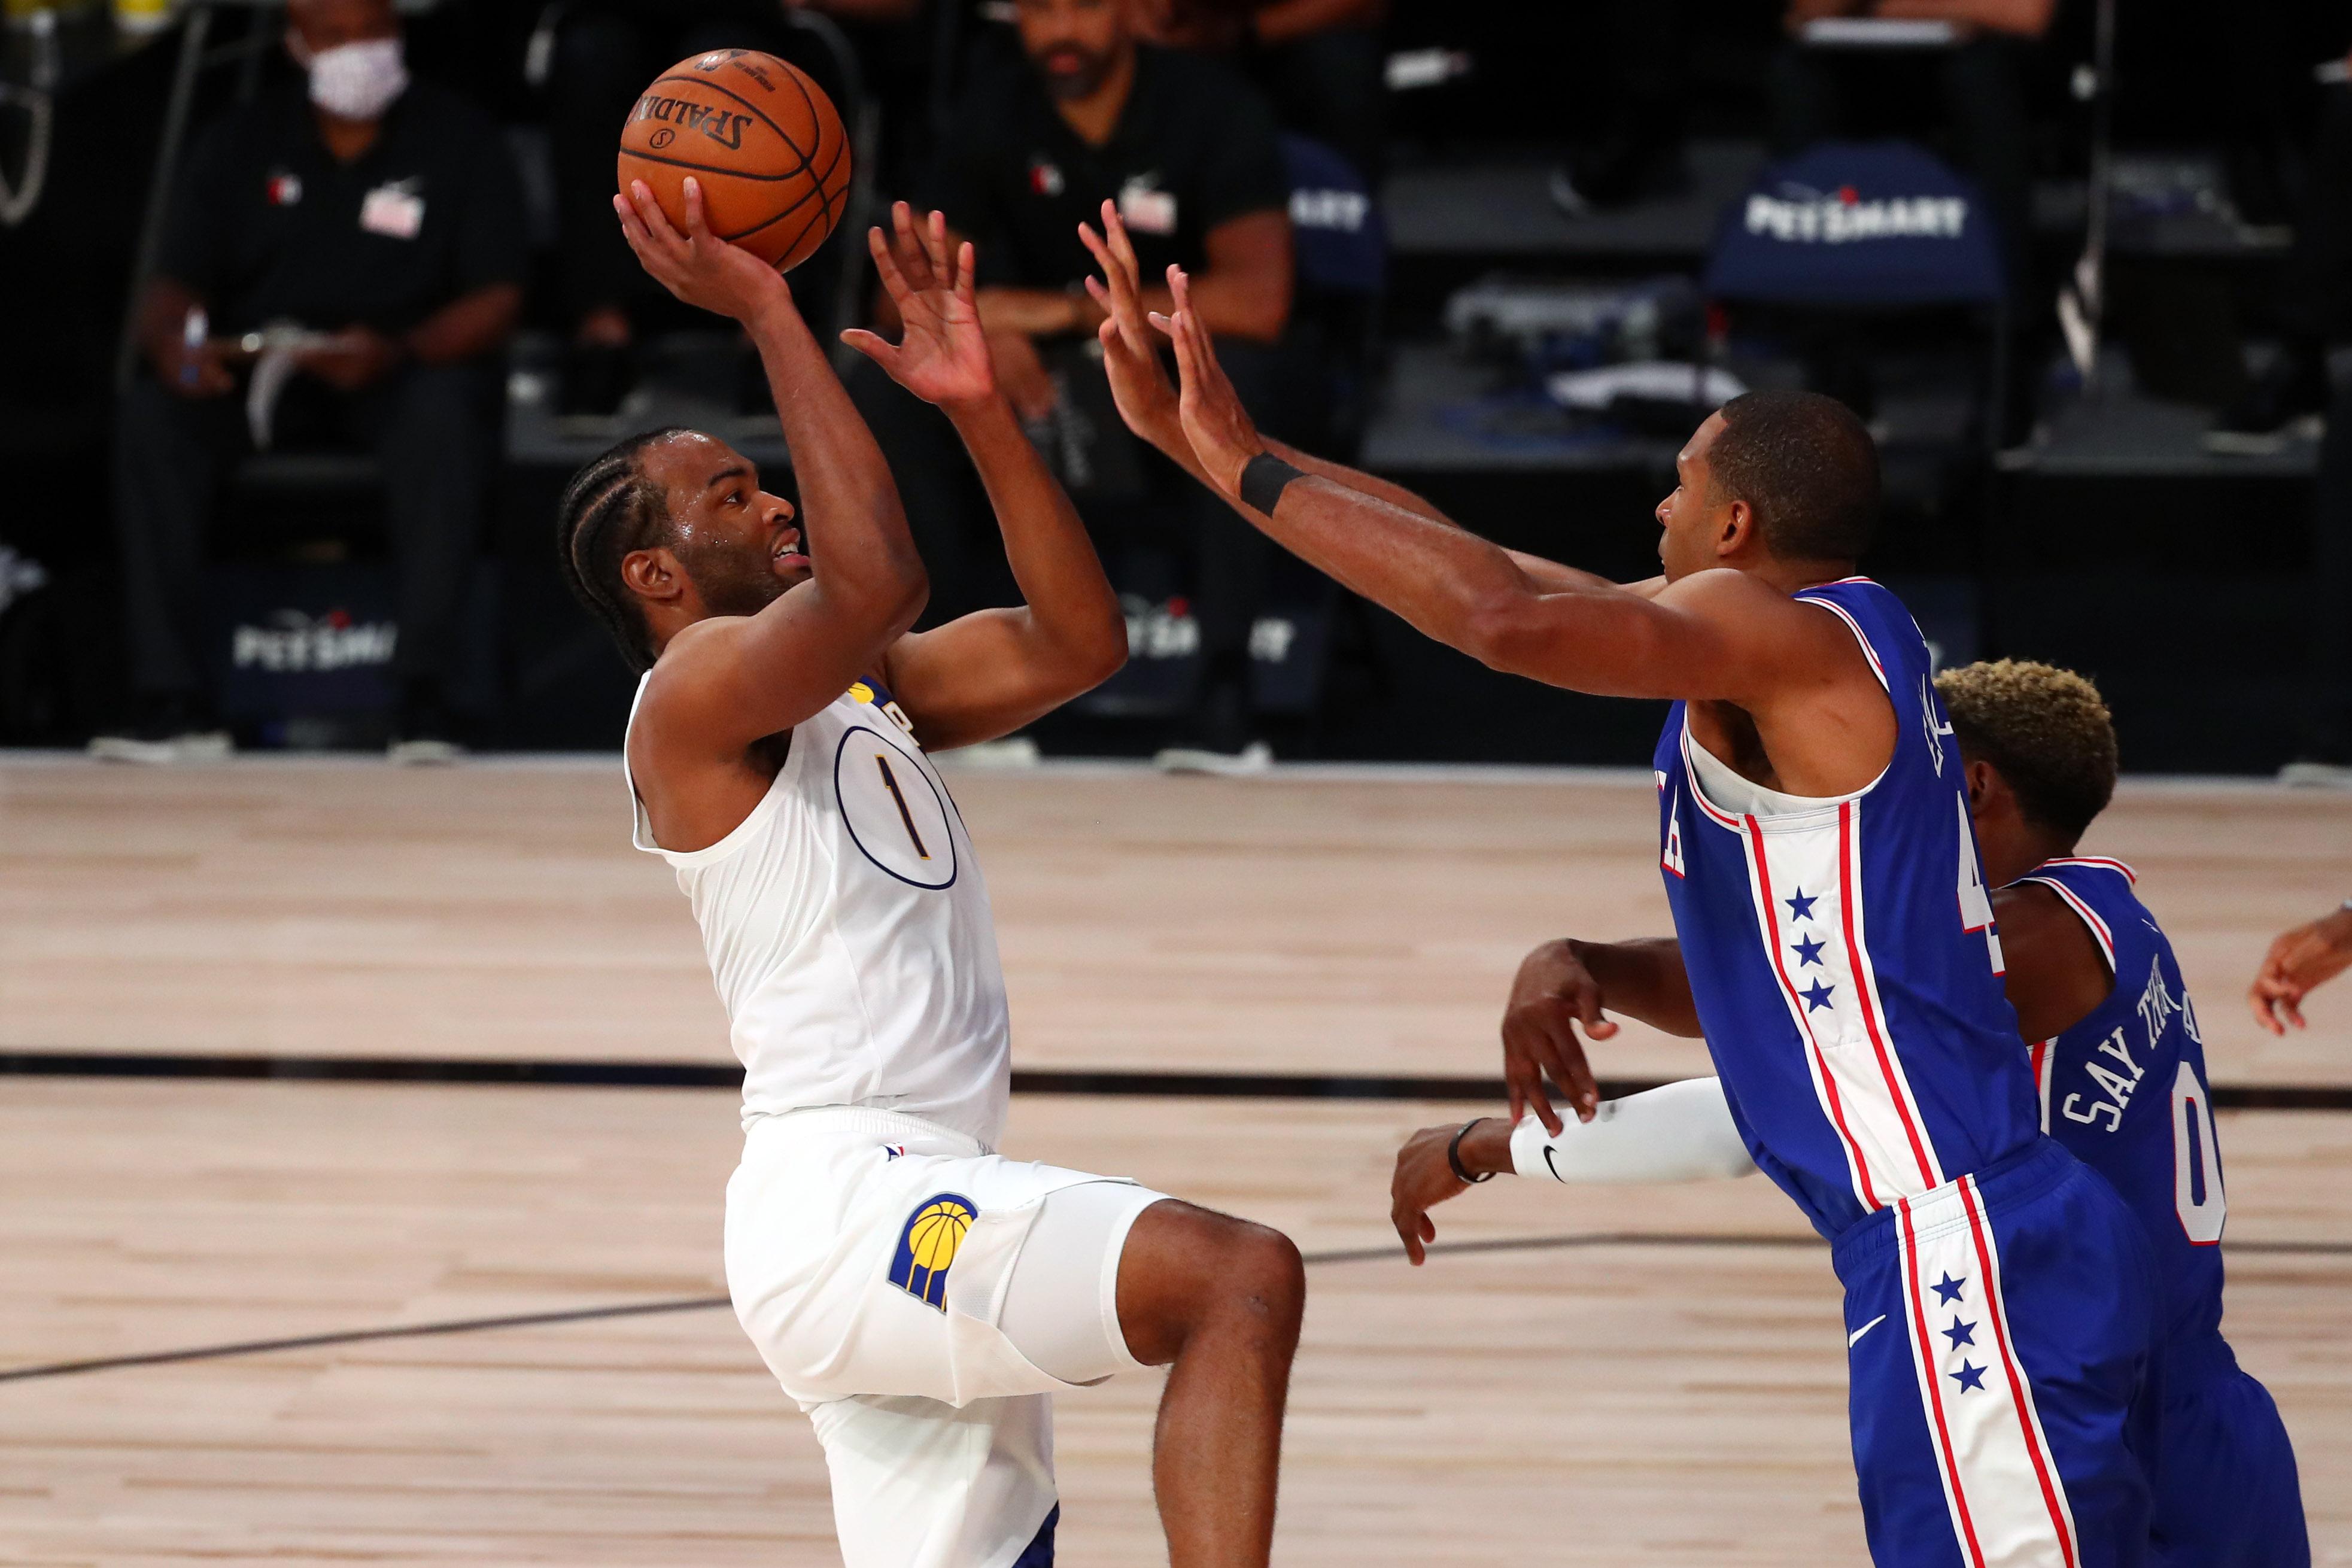 NBA: T.J. Warren scores 53 points in Pacers win over Sixers